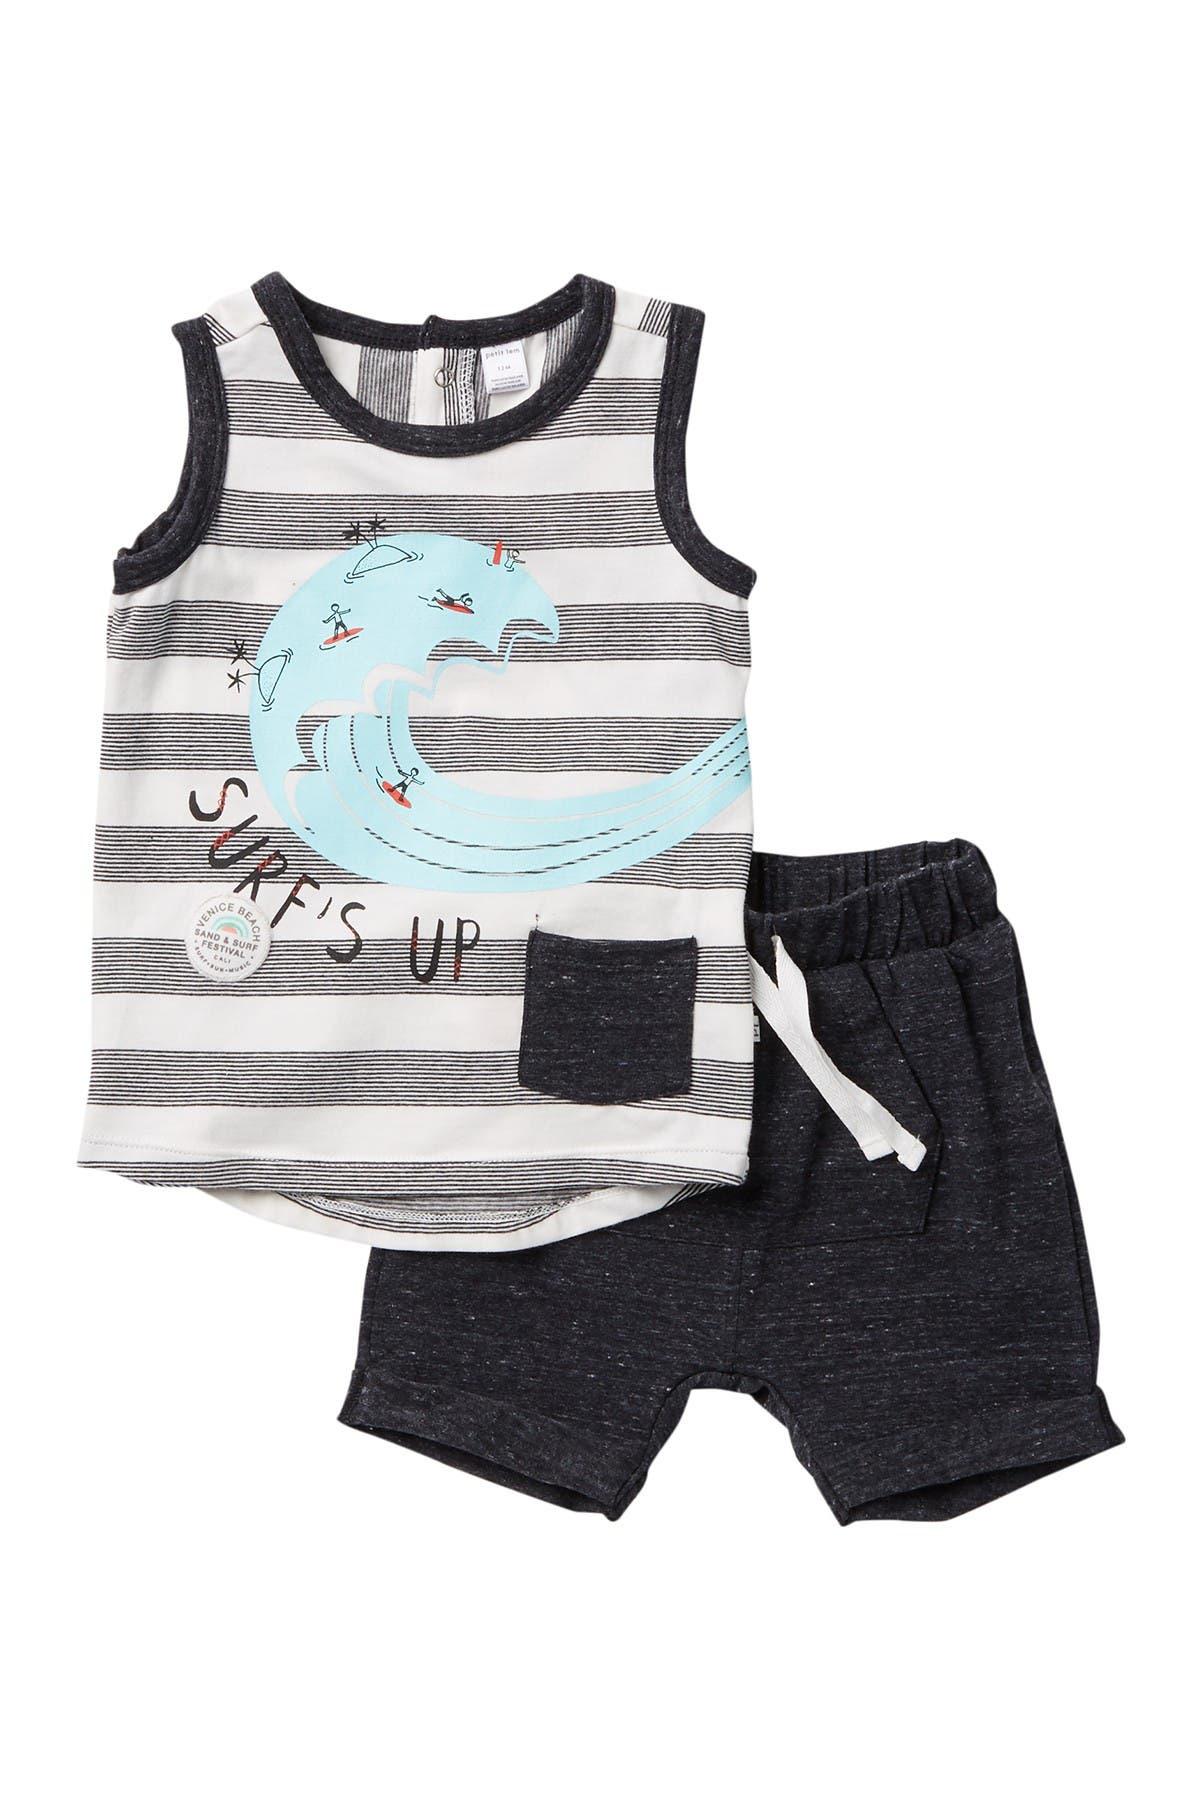 Image of Petit Lem Surf's Up Tank & Knit Shorts Set